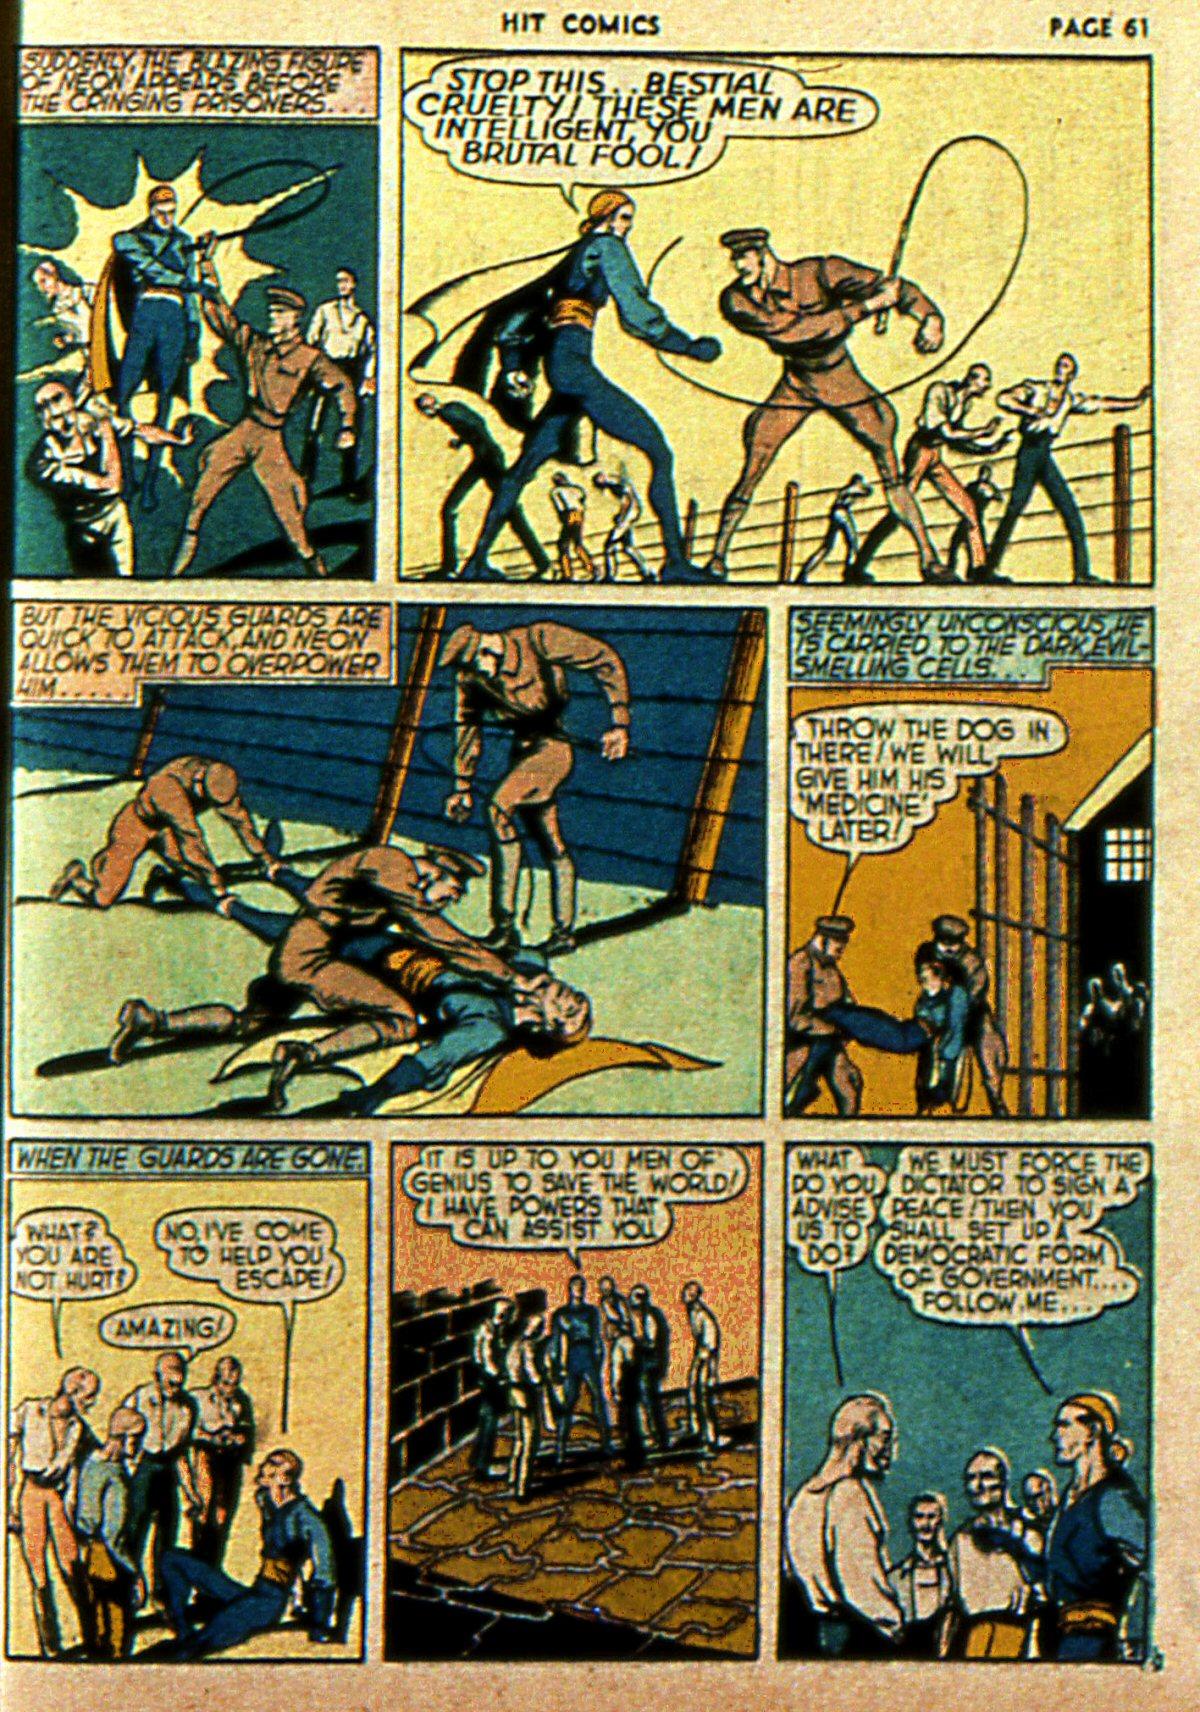 Read online Hit Comics comic -  Issue #2 - 63